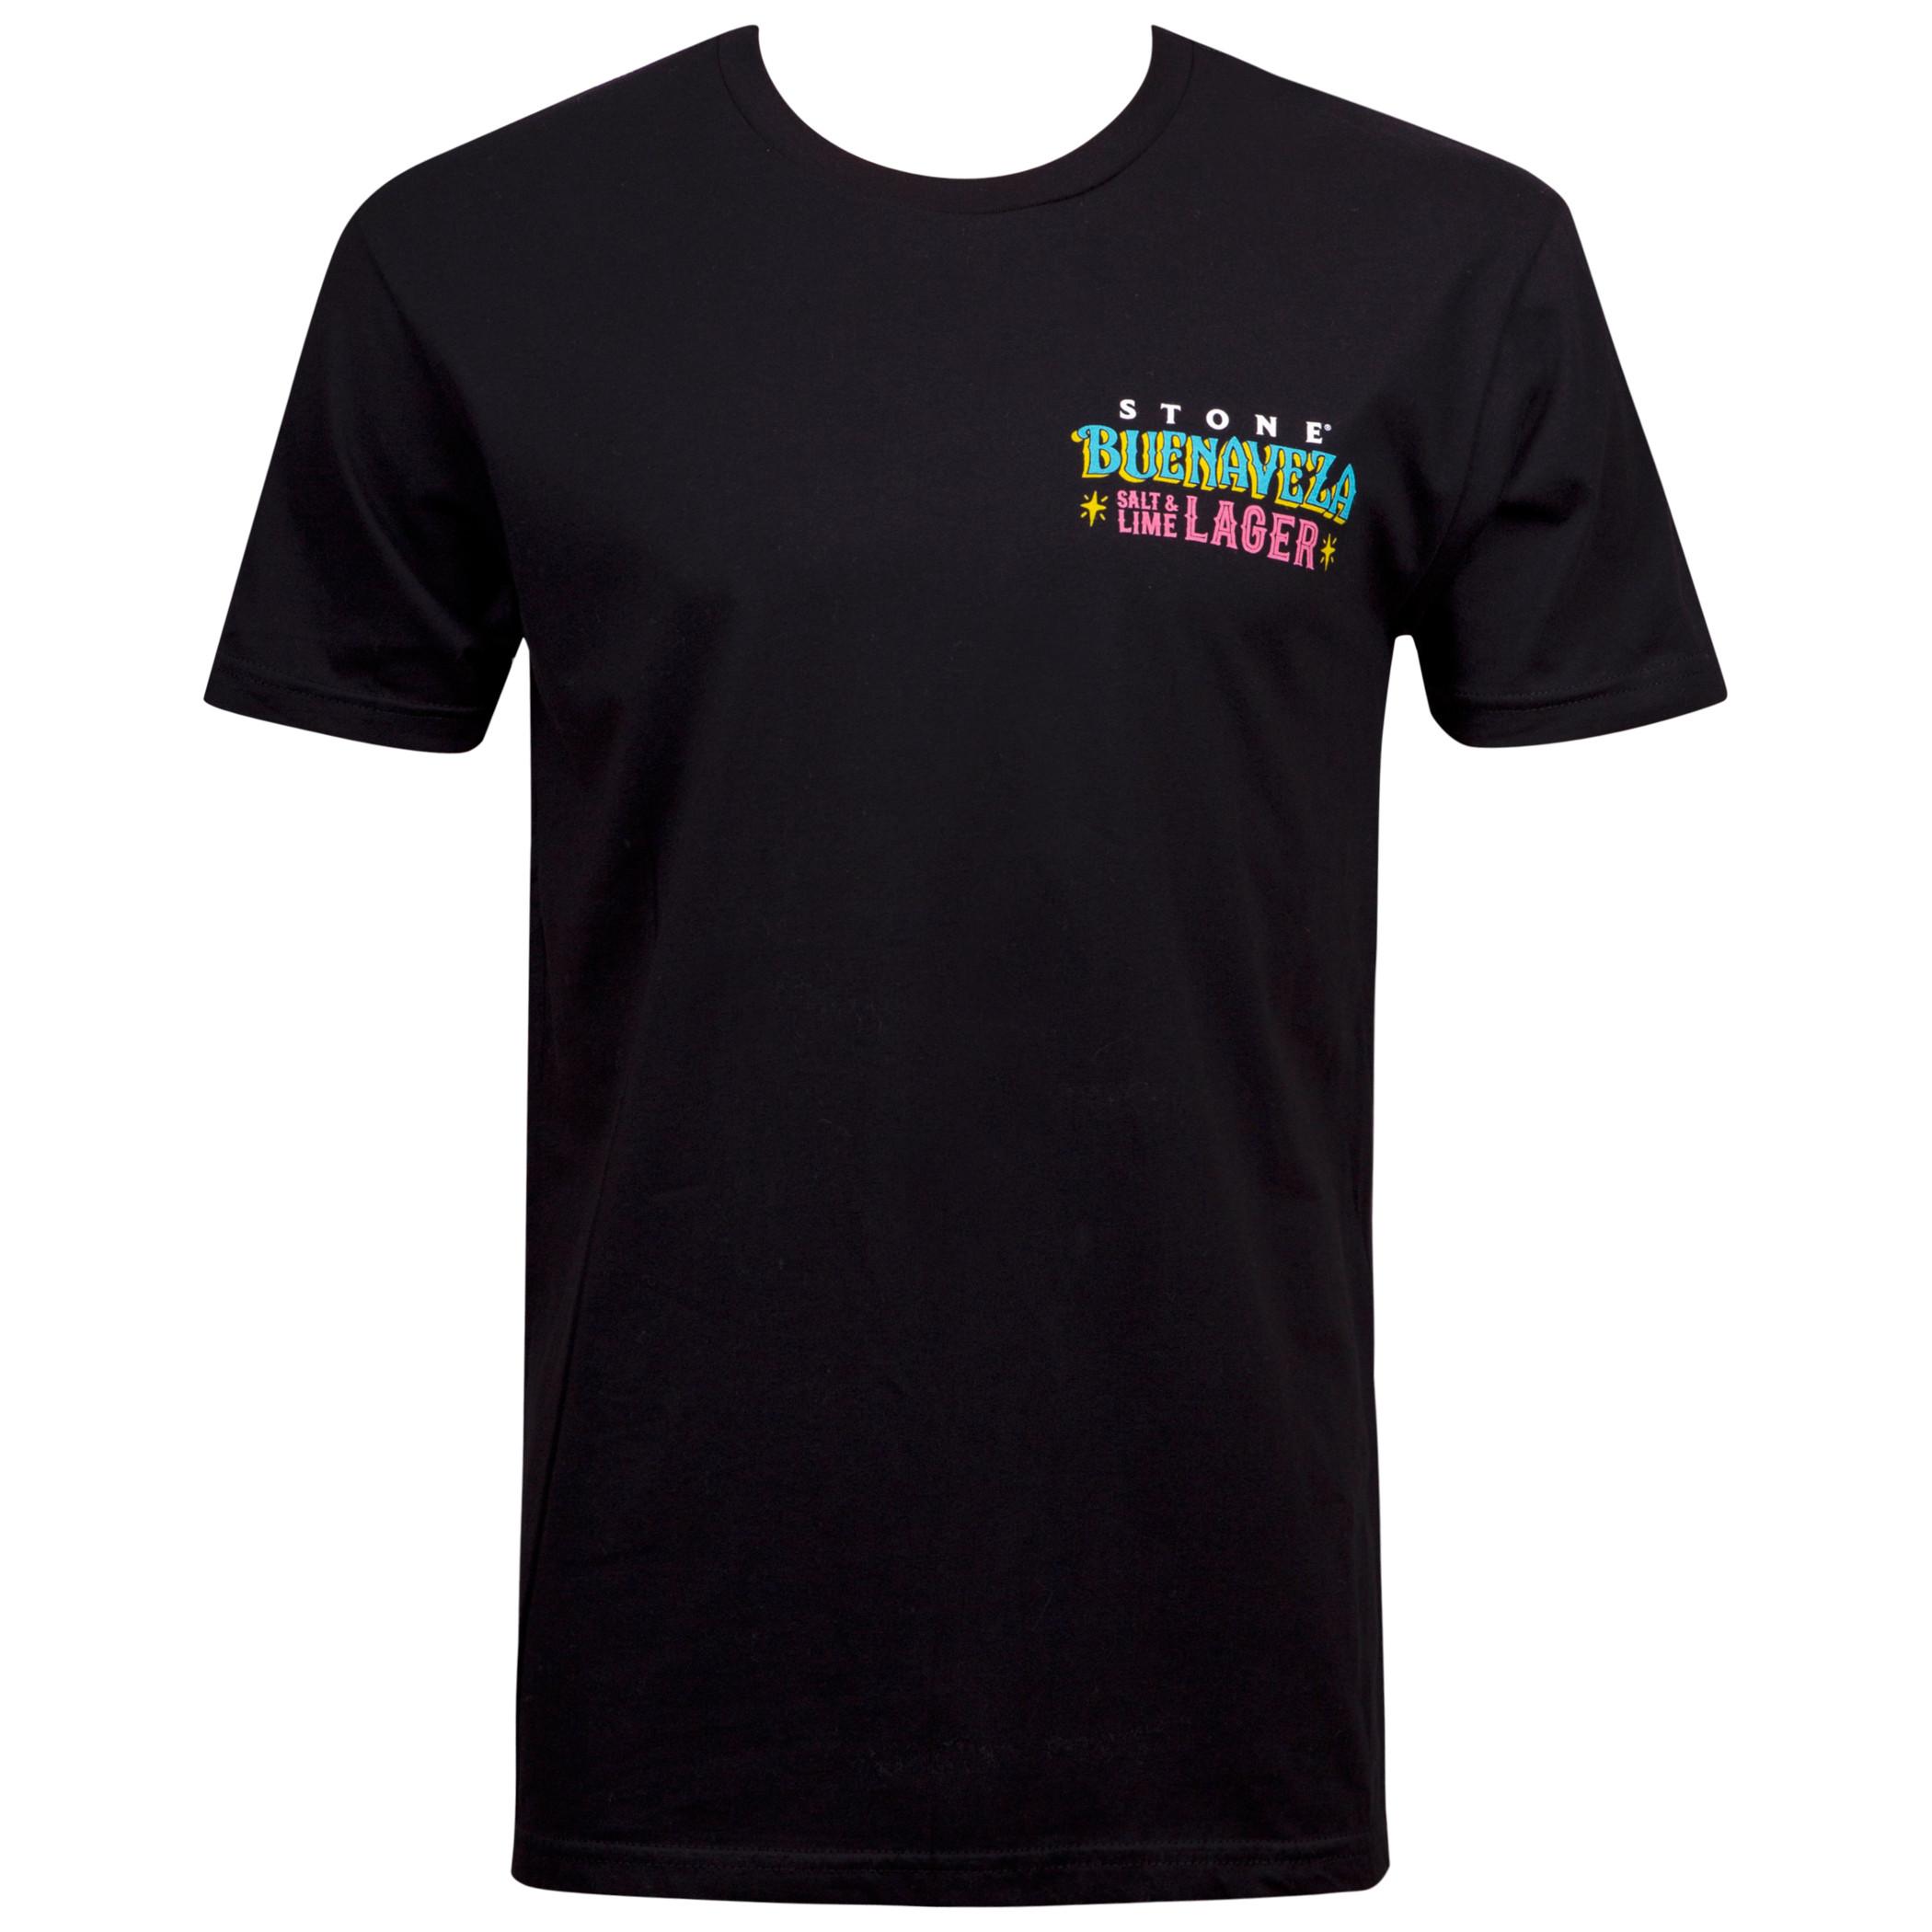 Stone Brewing Men's Black Buenaveza T-Shirt